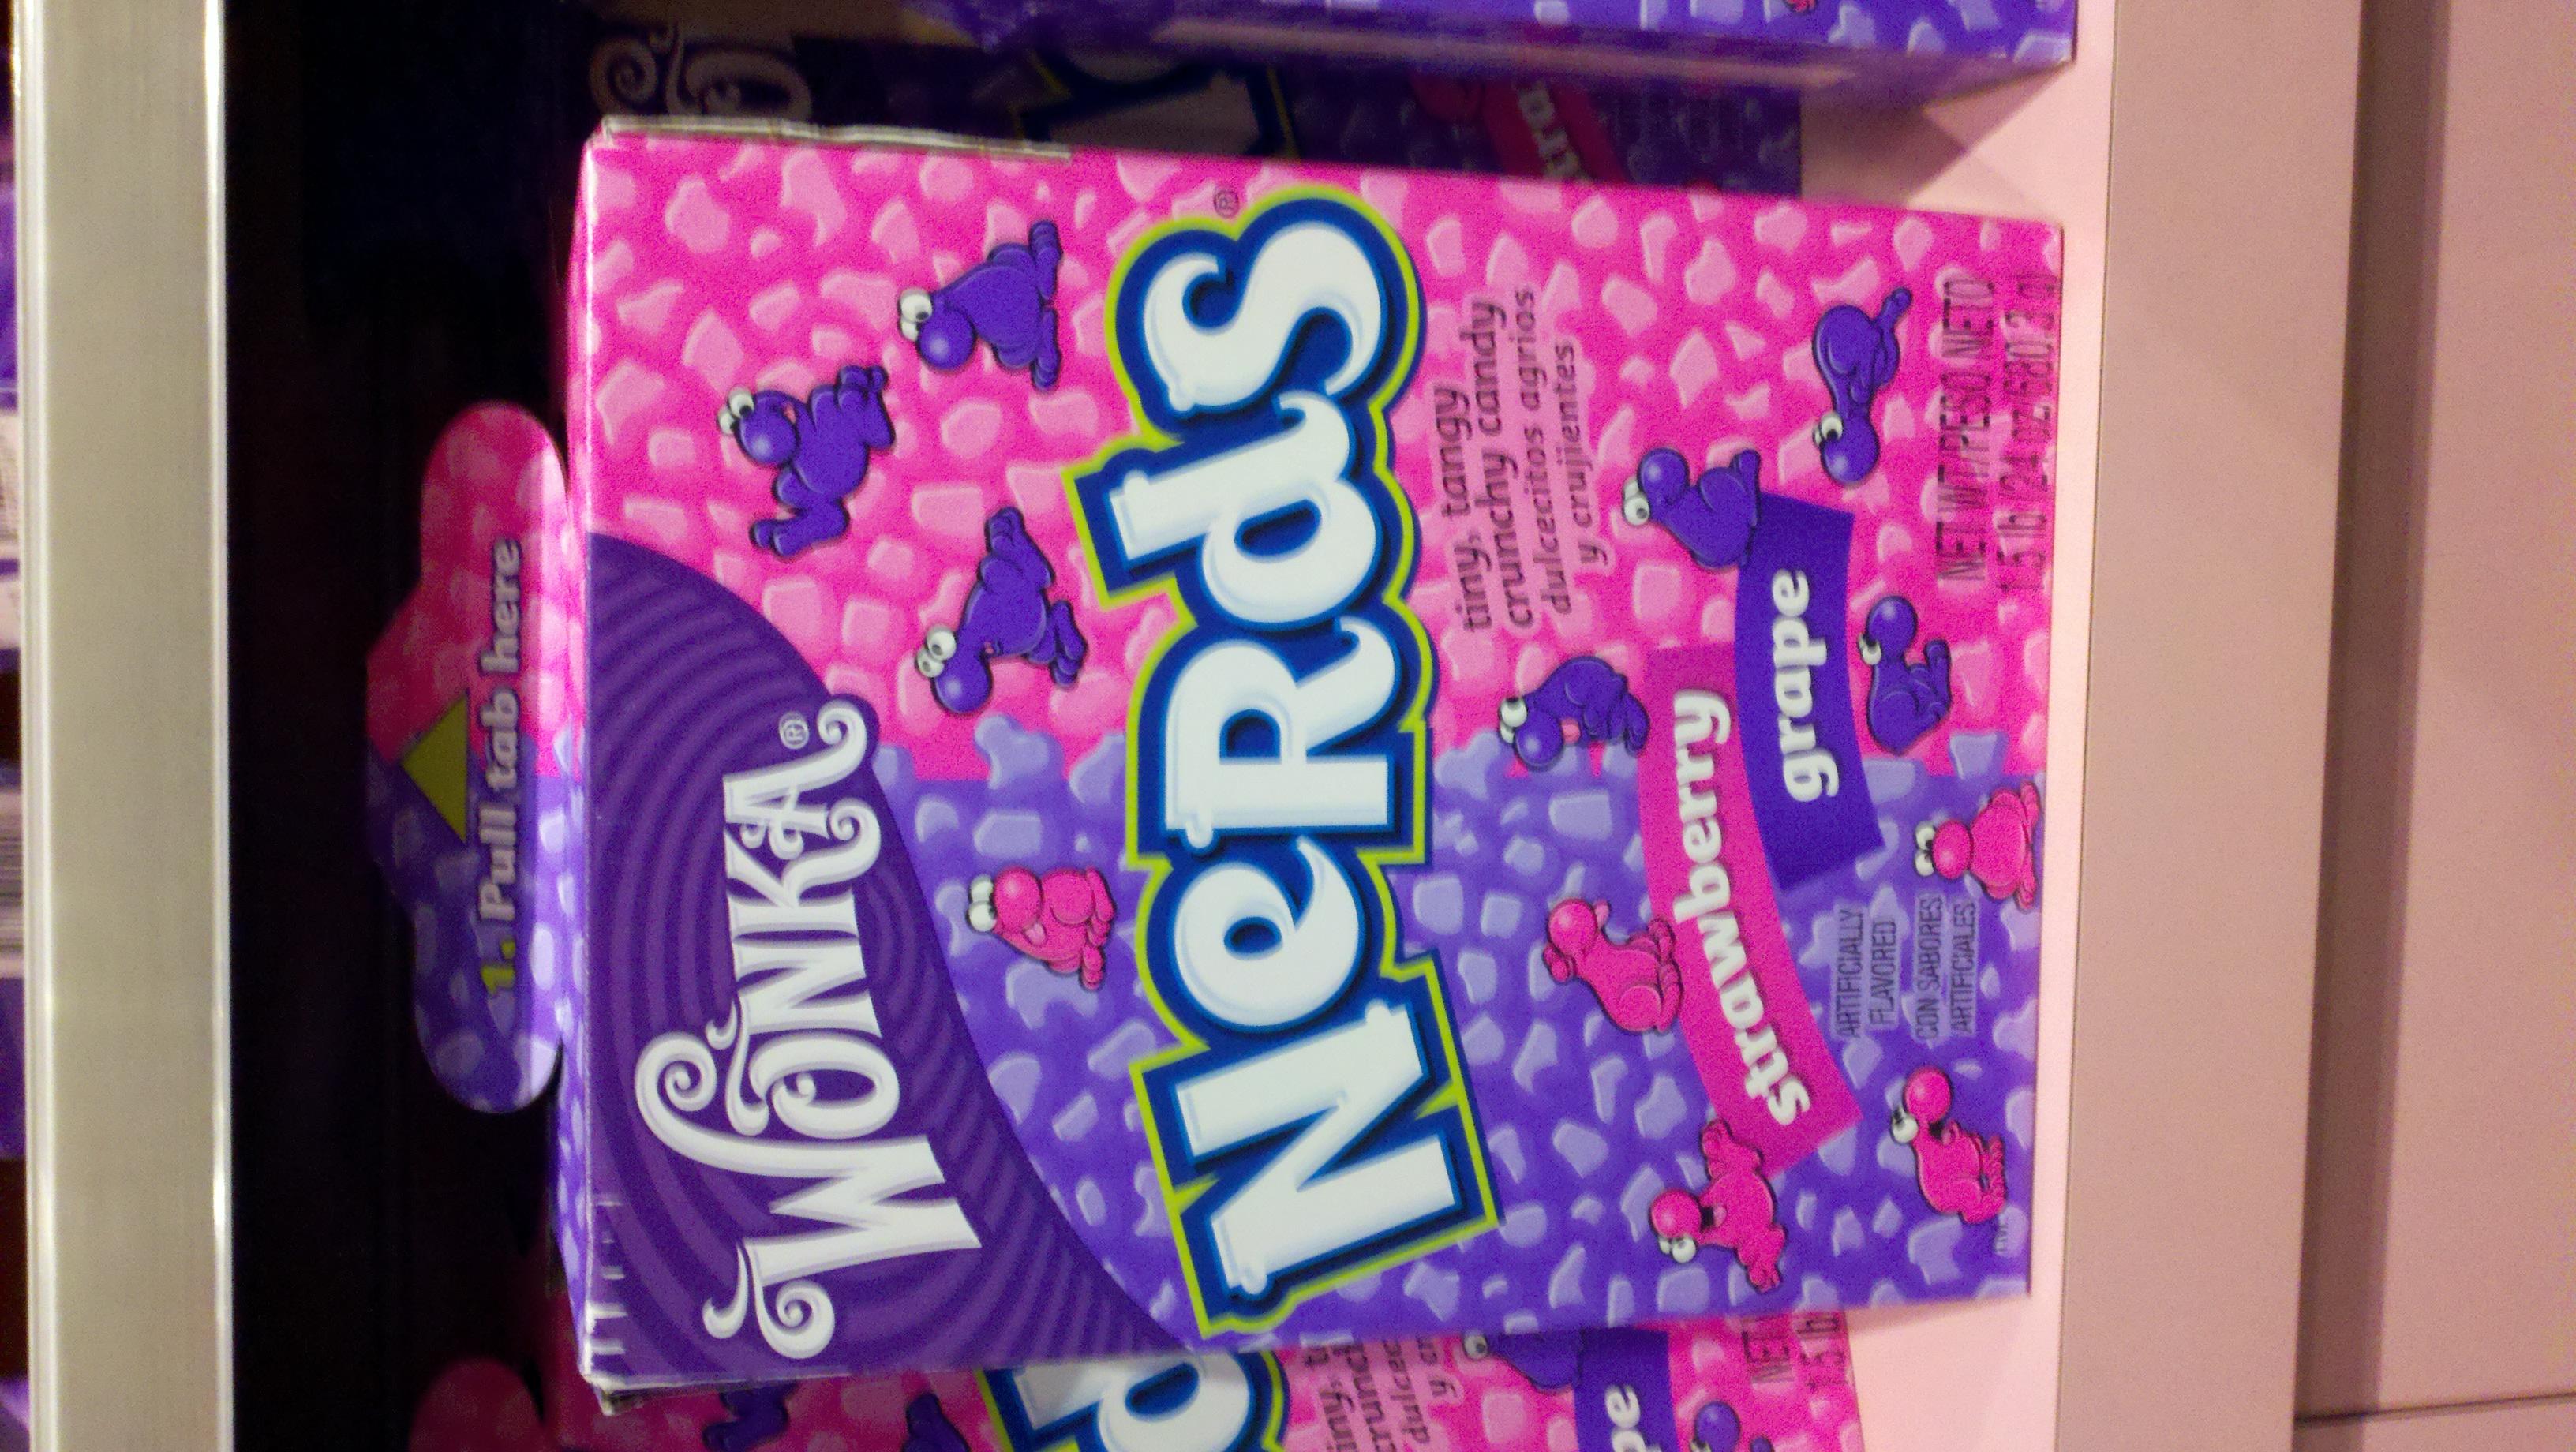 toys r us, nyc :: a 1.5 pound box of nerds!! I wish I ate it.